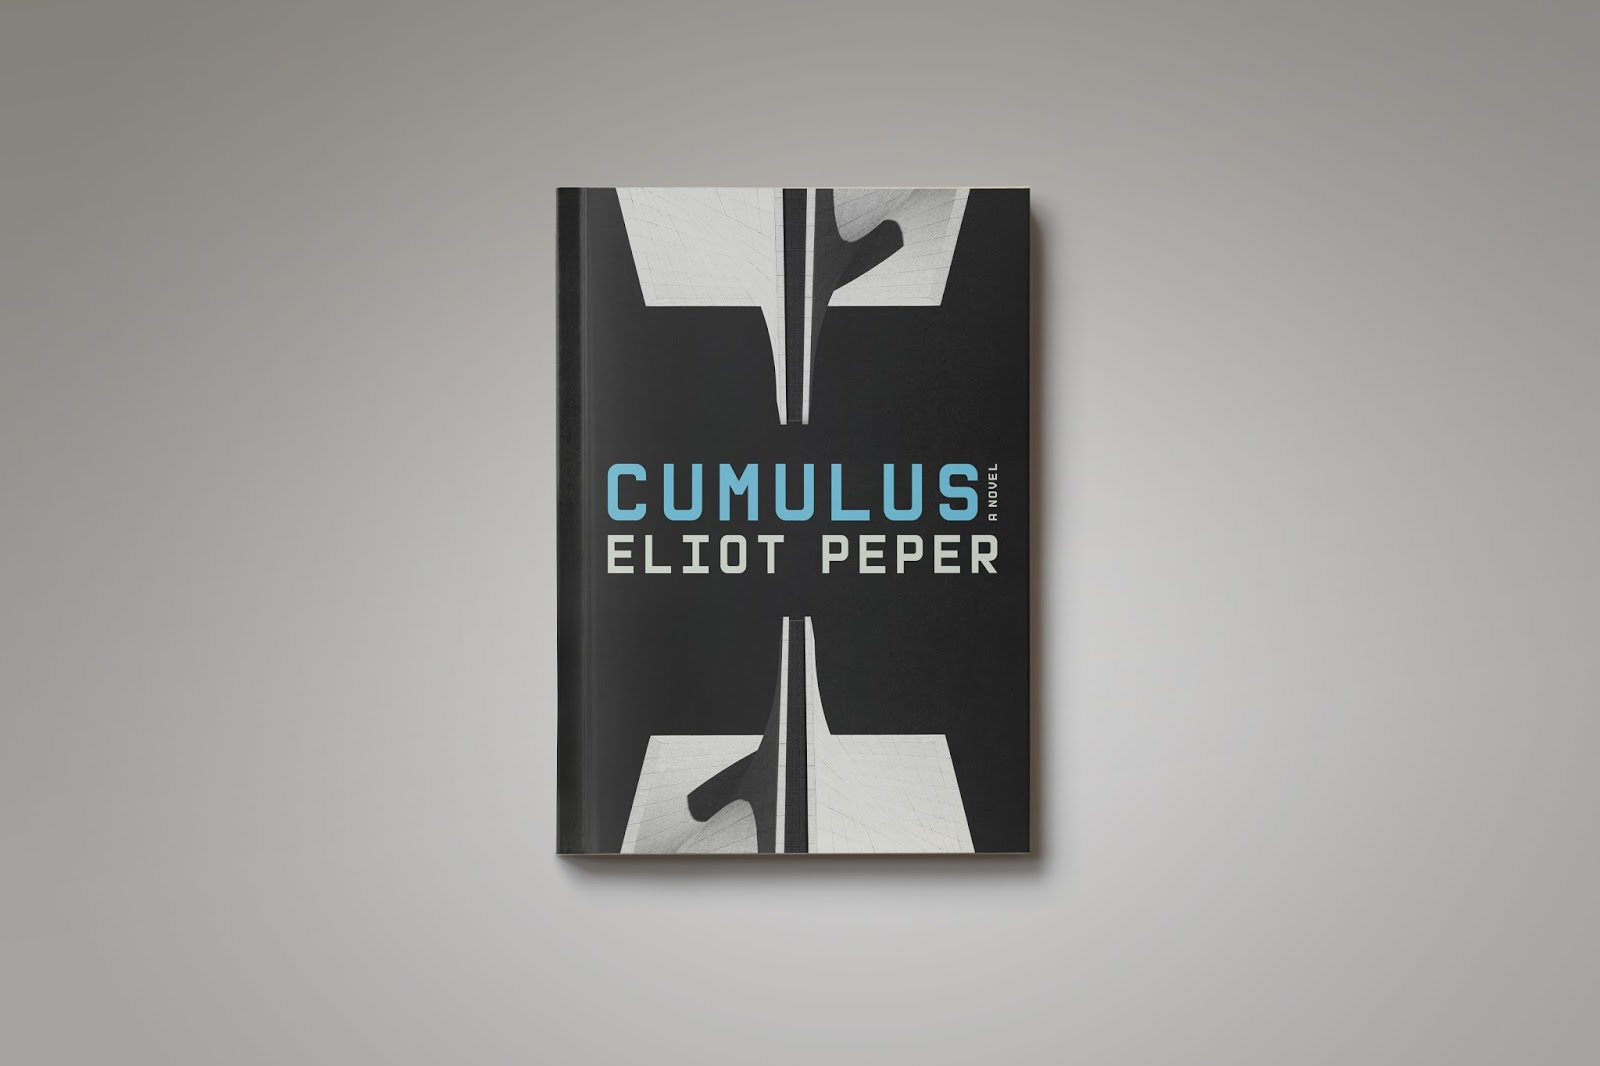 Eliot Peper: Five Things I Learned Self-Publishing My Novel, Cumulus